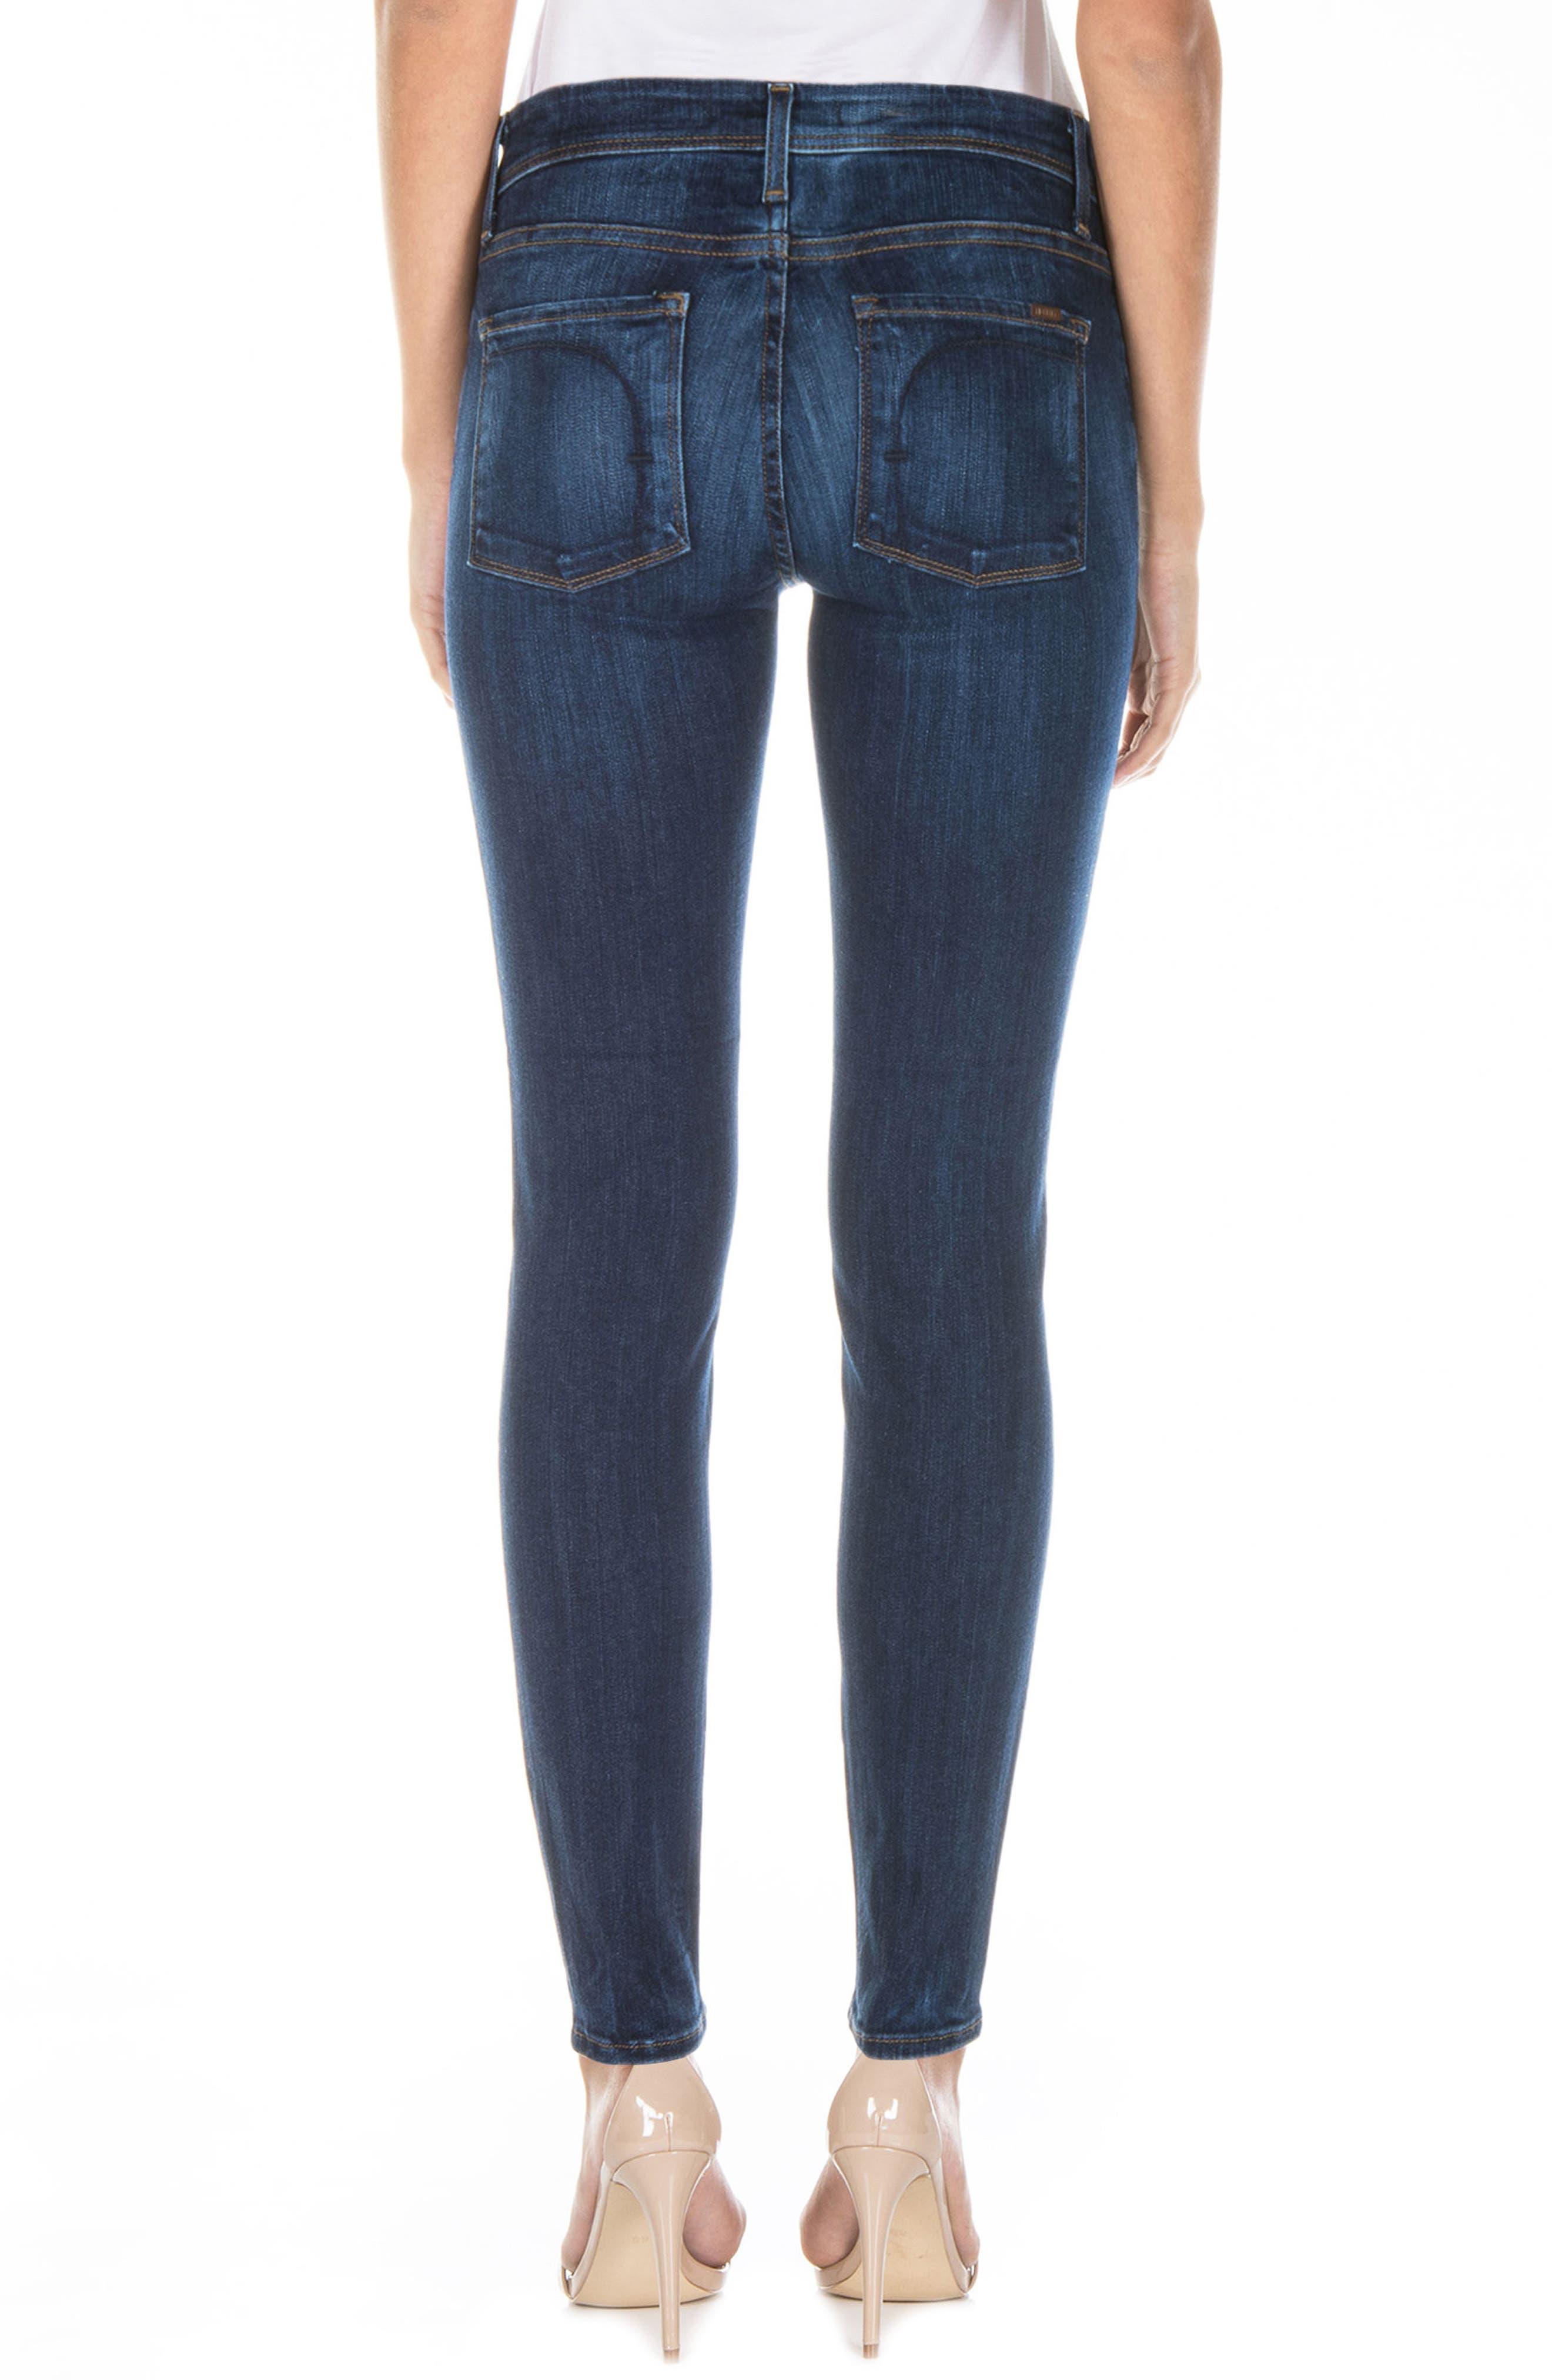 Gwen High Waist Skinny Jeans,                             Alternate thumbnail 2, color,                             400